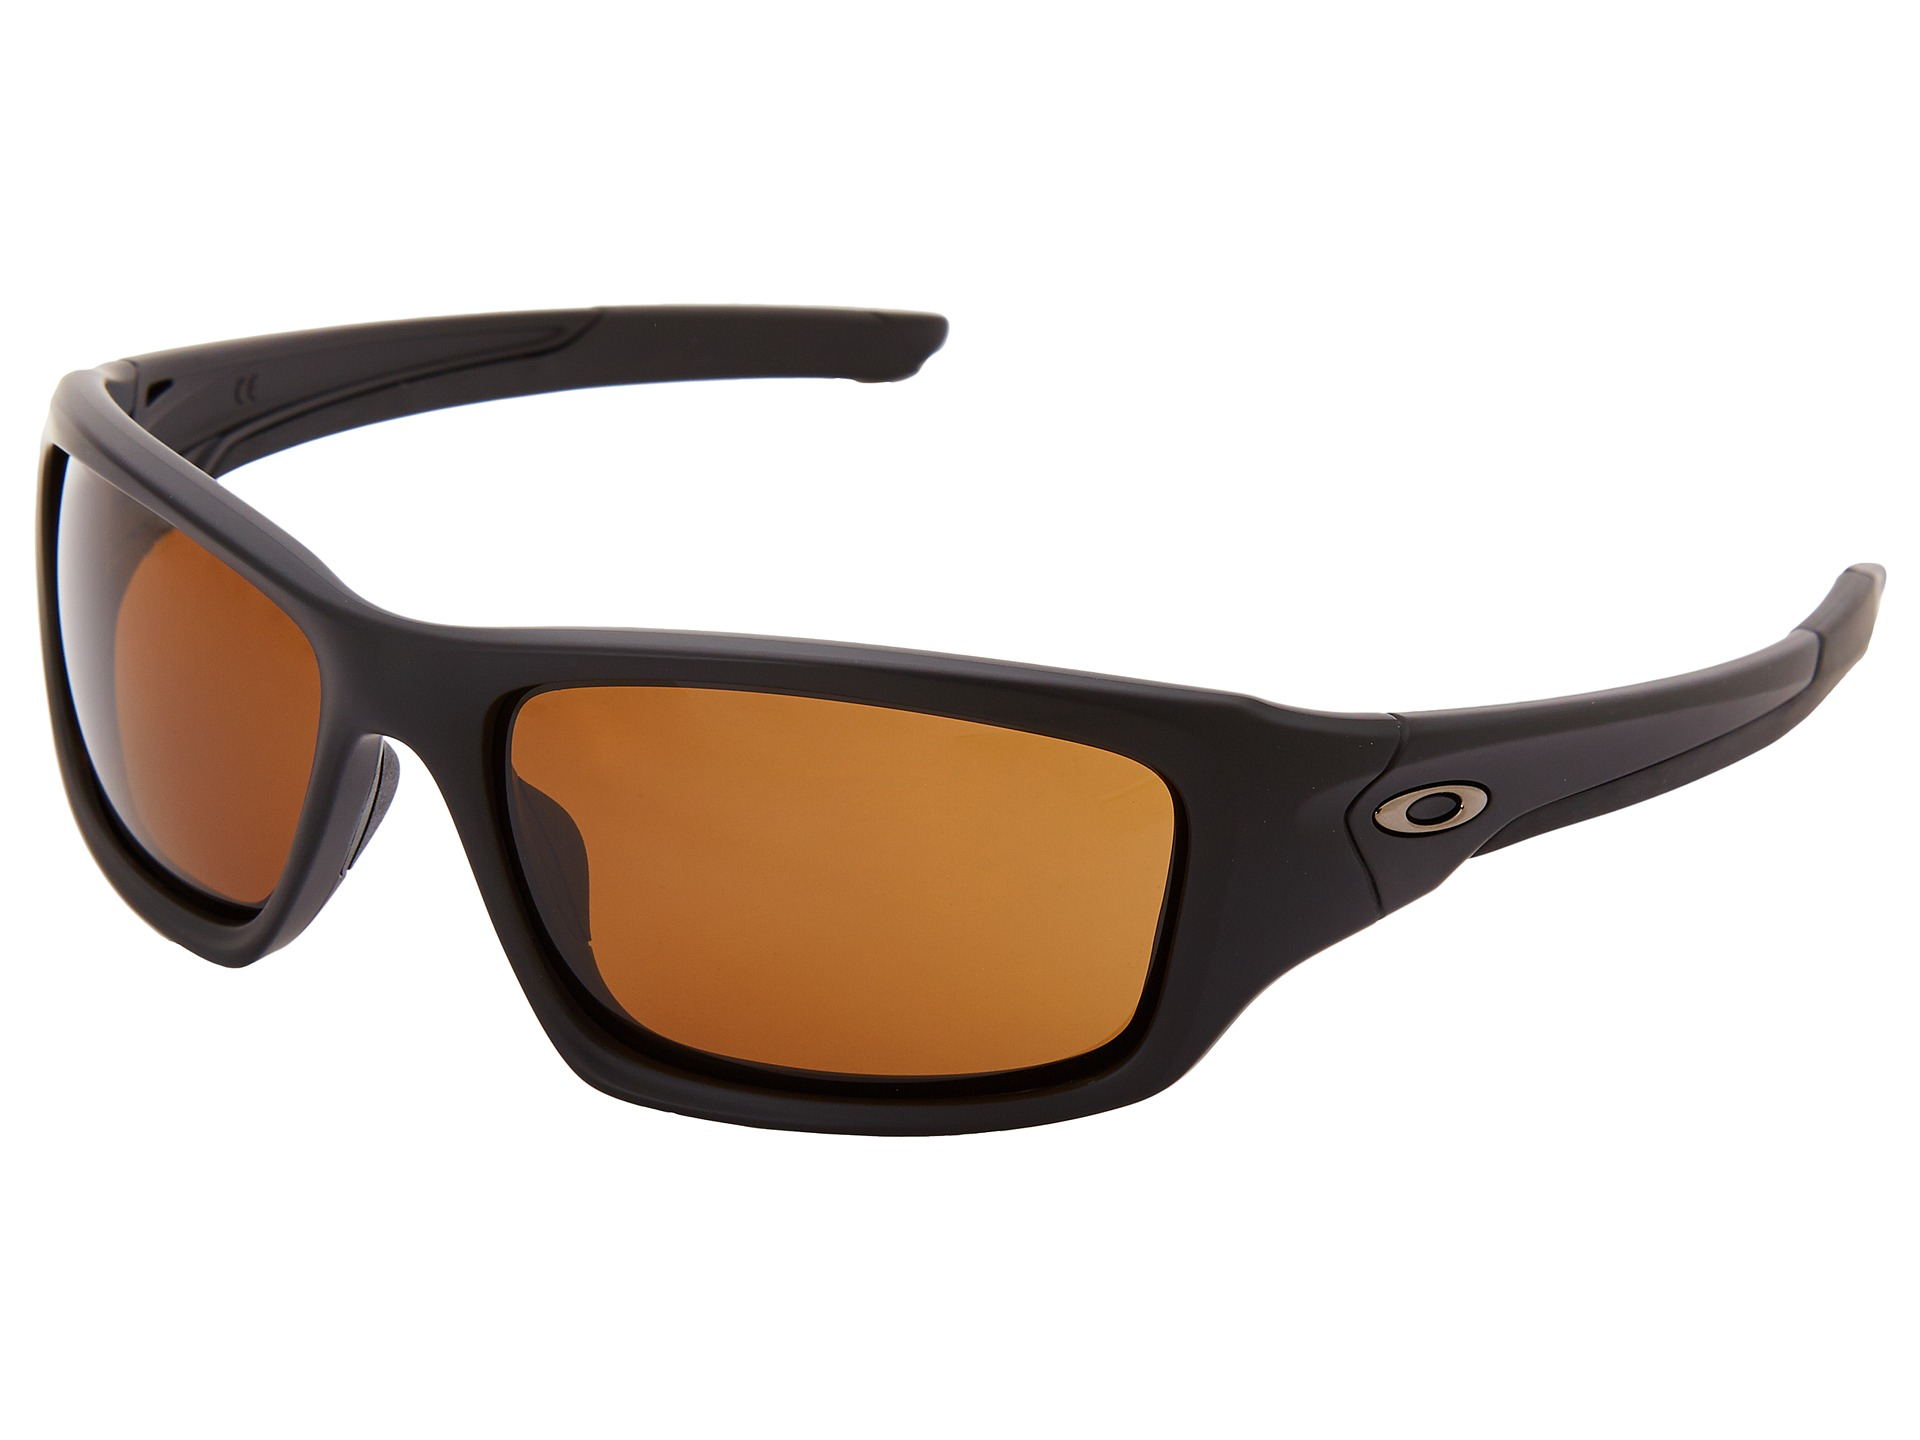 51e6e4bbb3 Oakley SI Double Edge Sunglasses with Matte Black Frame and Prizm Maritime  Polarized Lens Oakley Valve Polarized Review